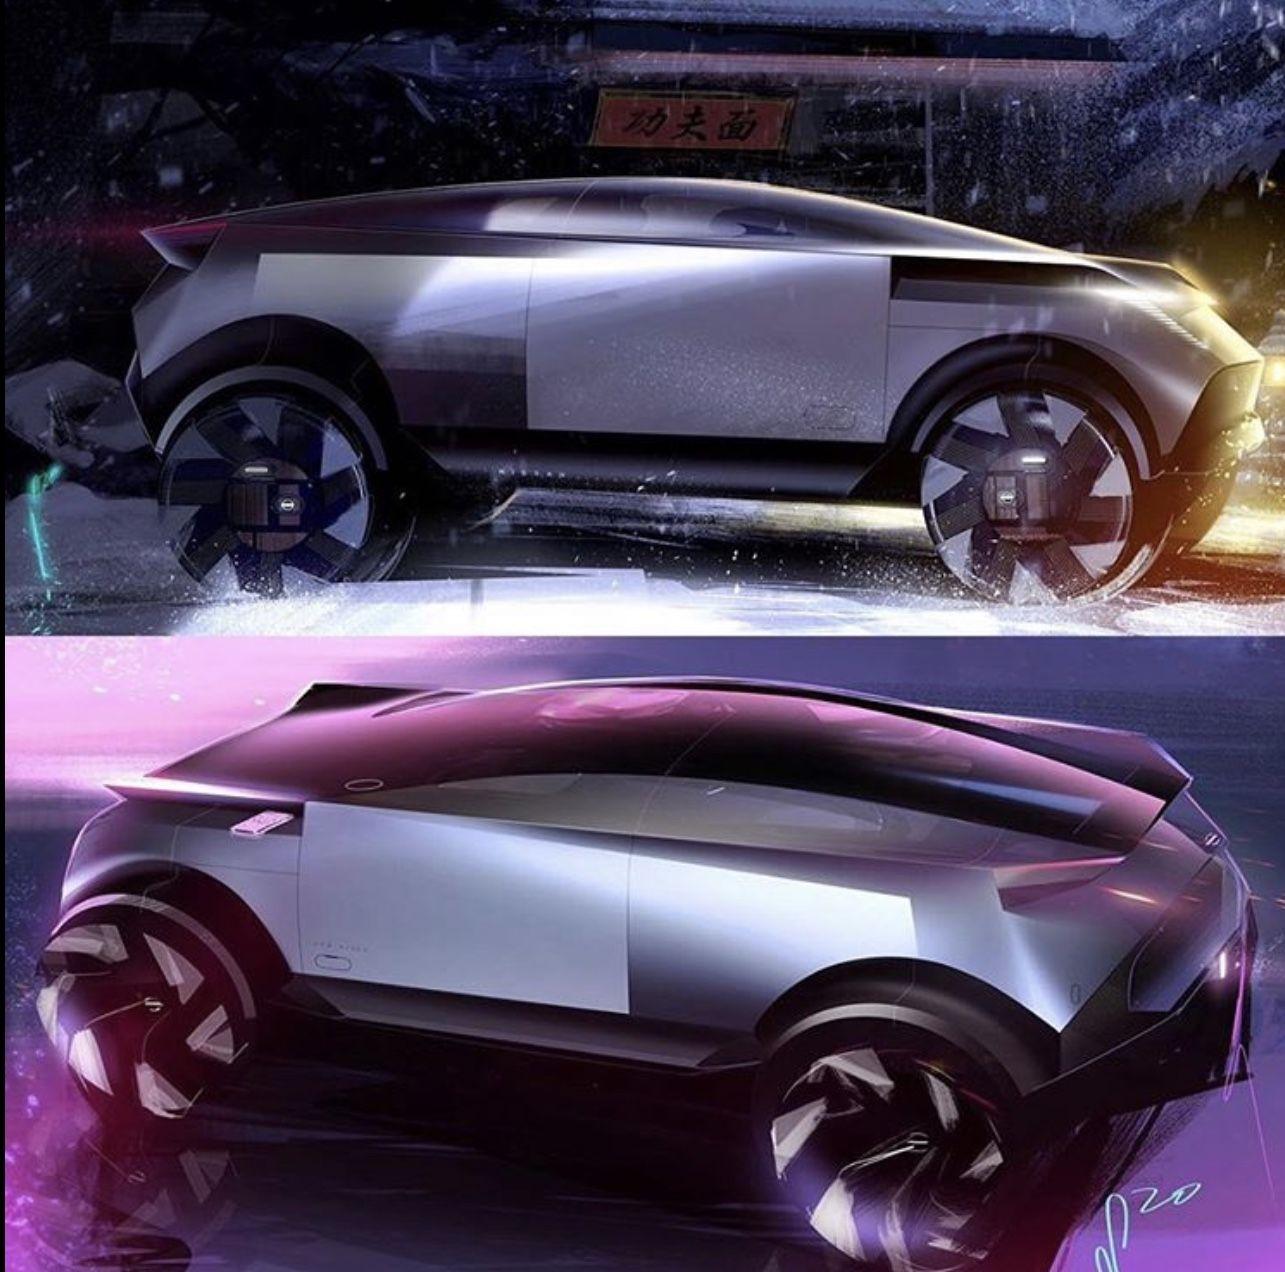 Pin By 손흥민바페 On Sketches Exterior In 2020 Futuristic Cars Design Car Design Car Design Sketch